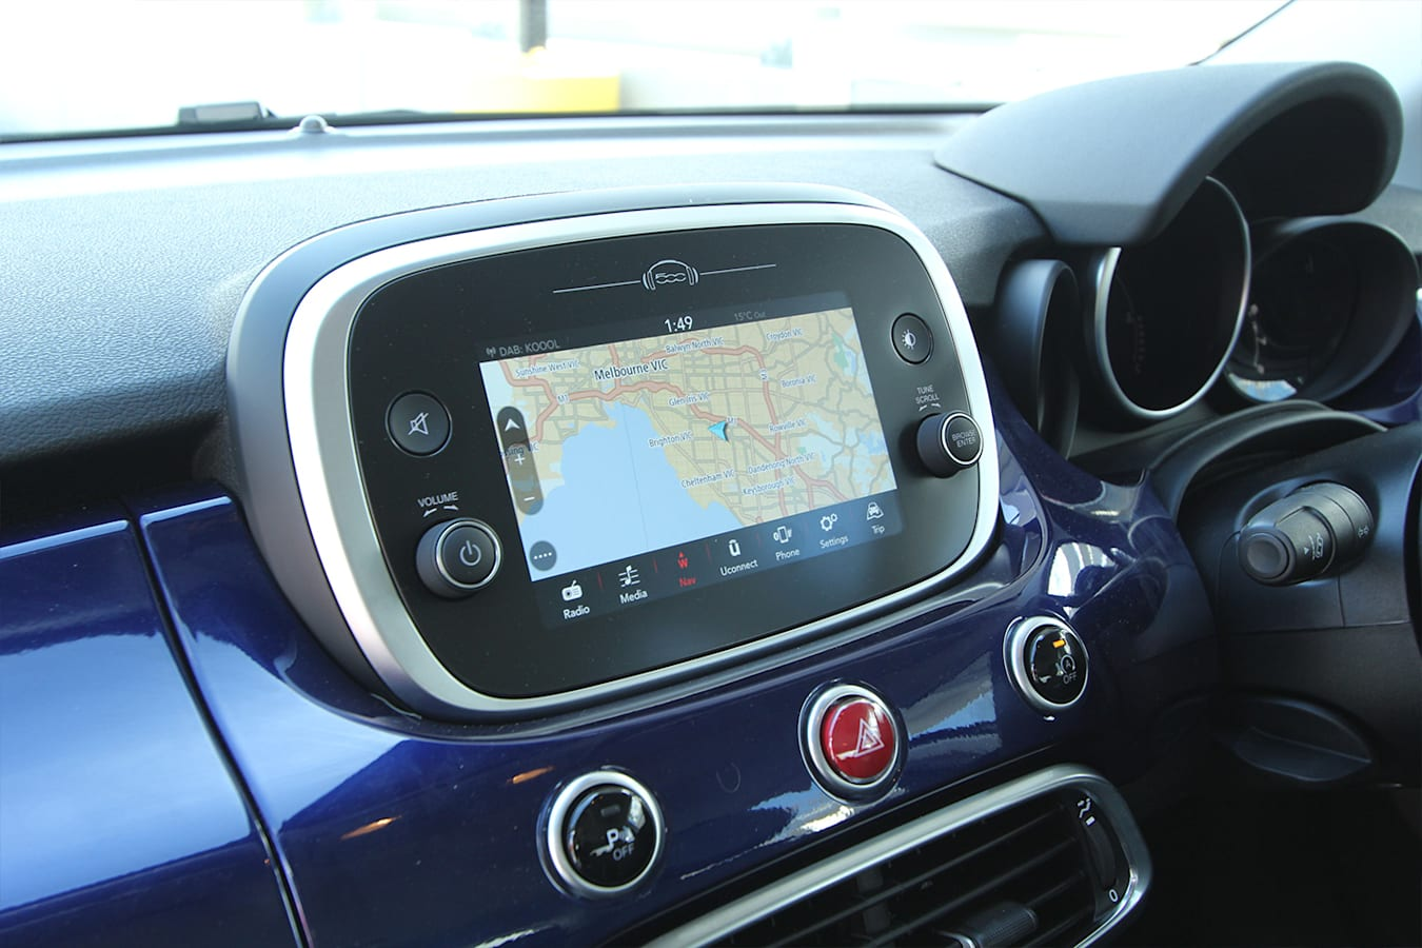 Fiat 500 X Screen Jpg